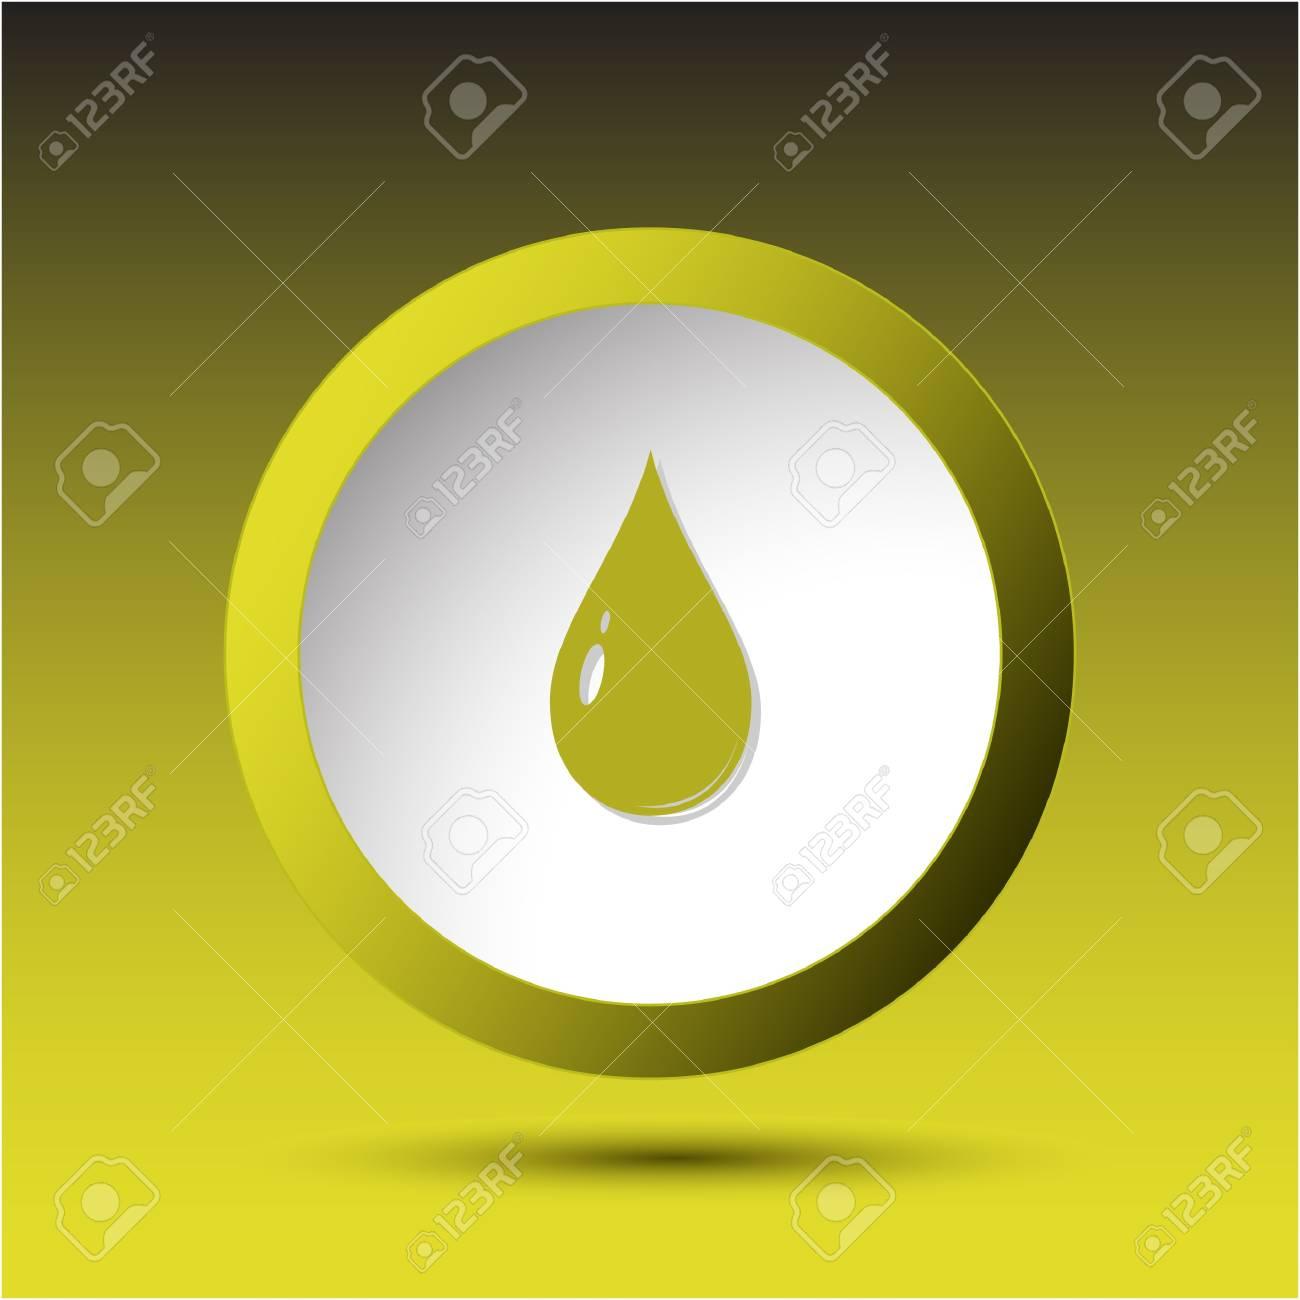 Drop. Plastic button. Stock Photo - 17127852